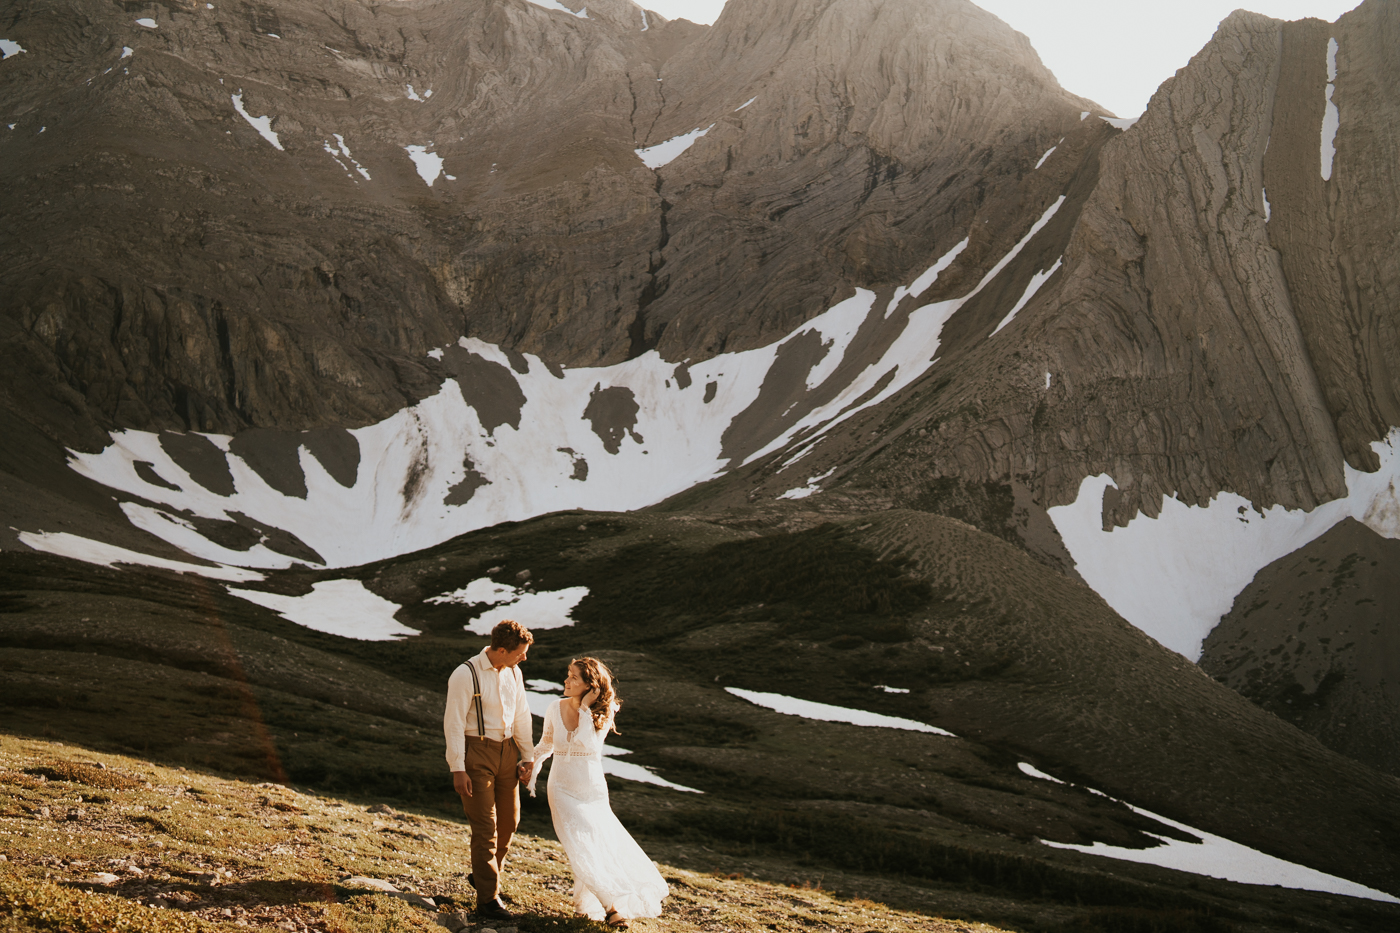 tyraephotography_photographer_wedding_elopement_engagement_photography-08404.jpg